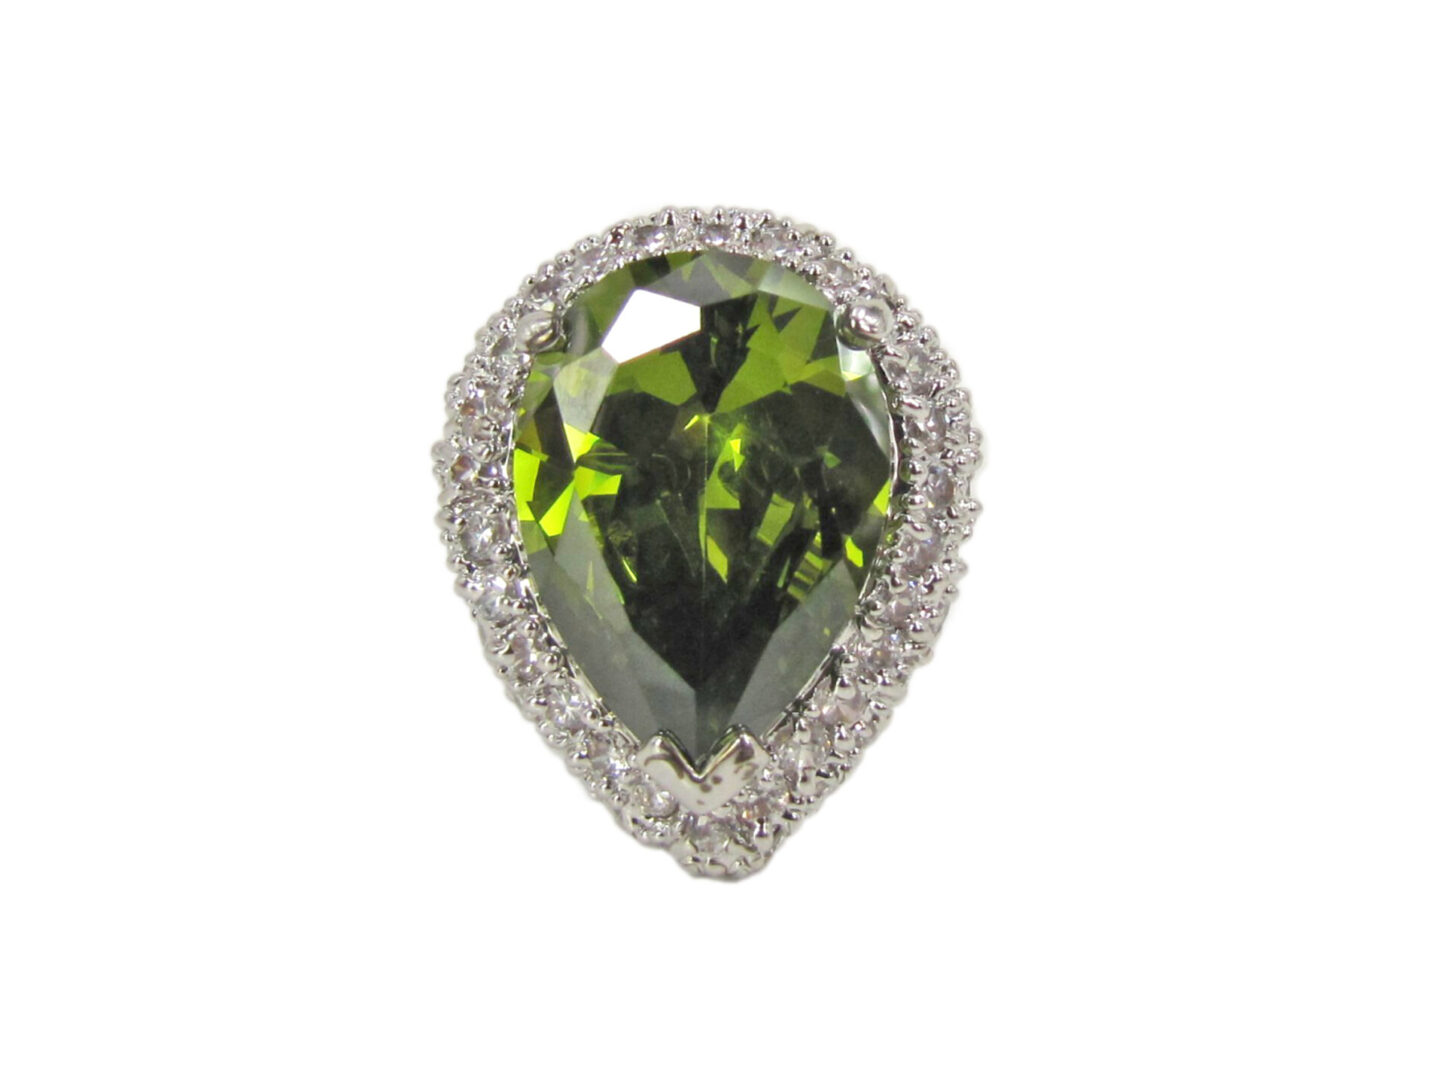 ring with teardrop emerald gem